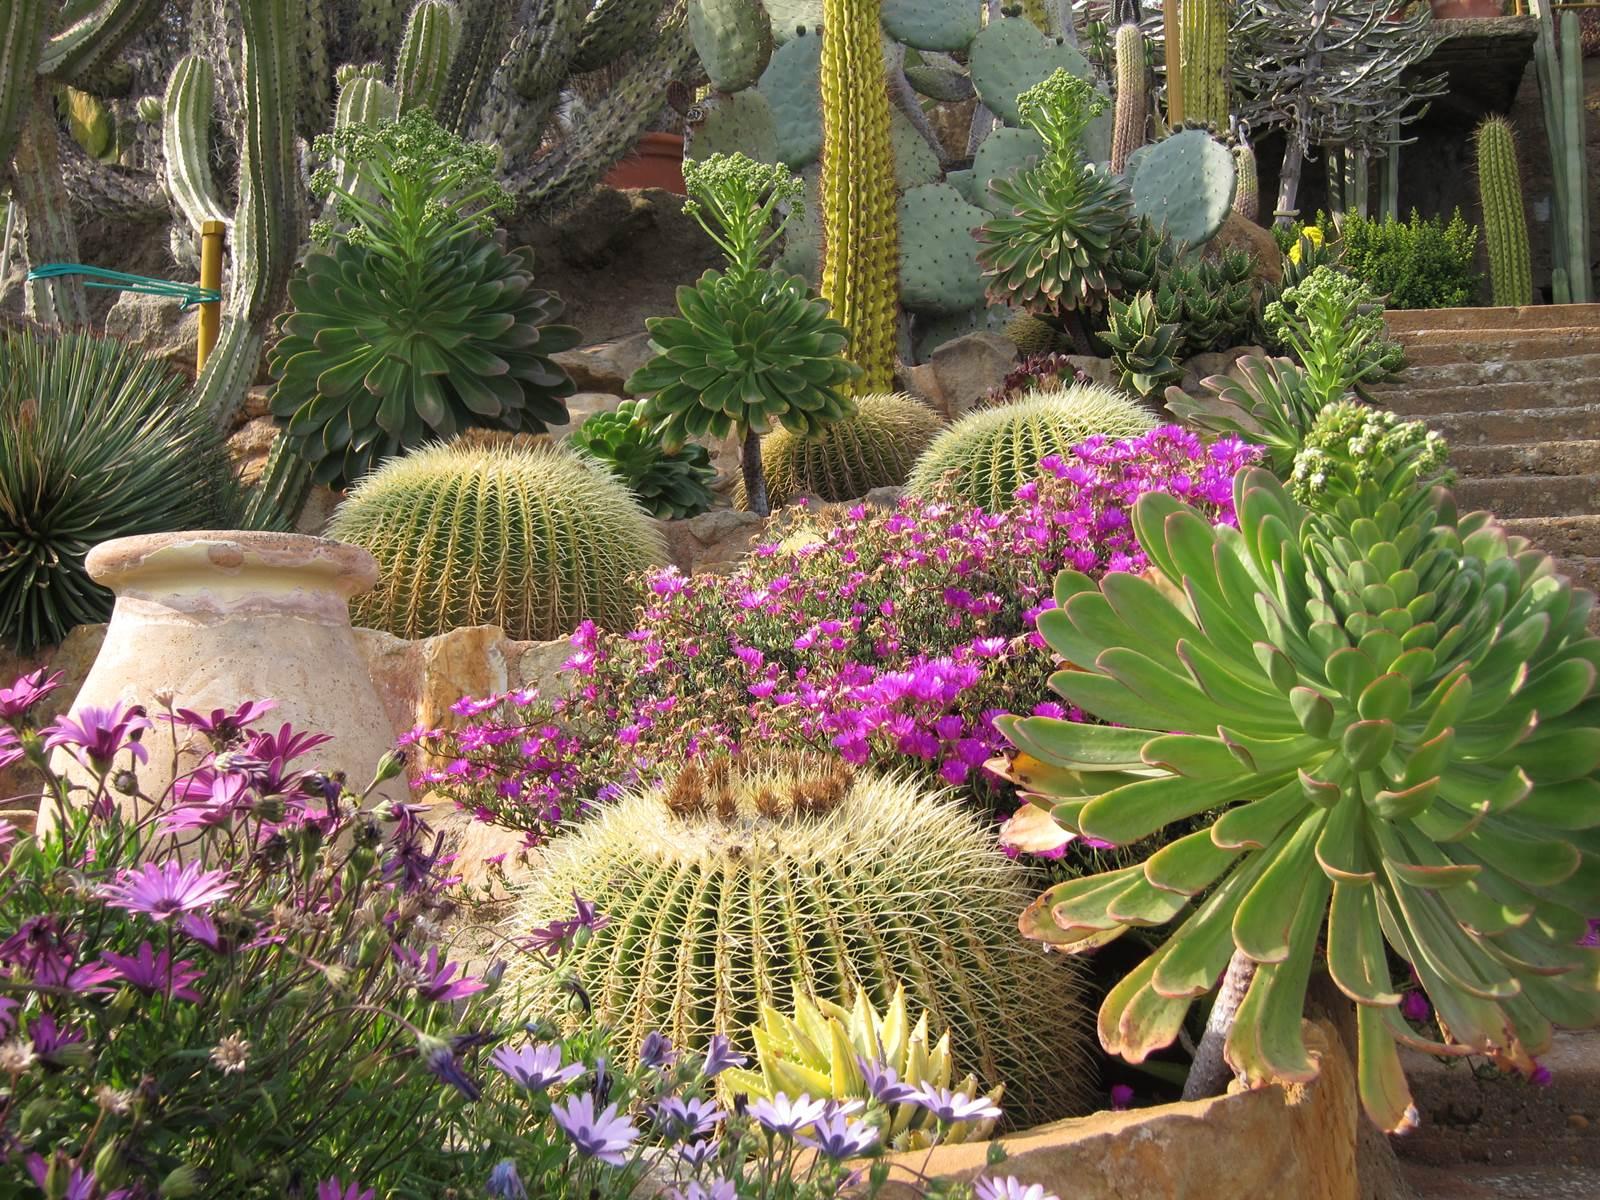 Pallanca jardin exotique (4)